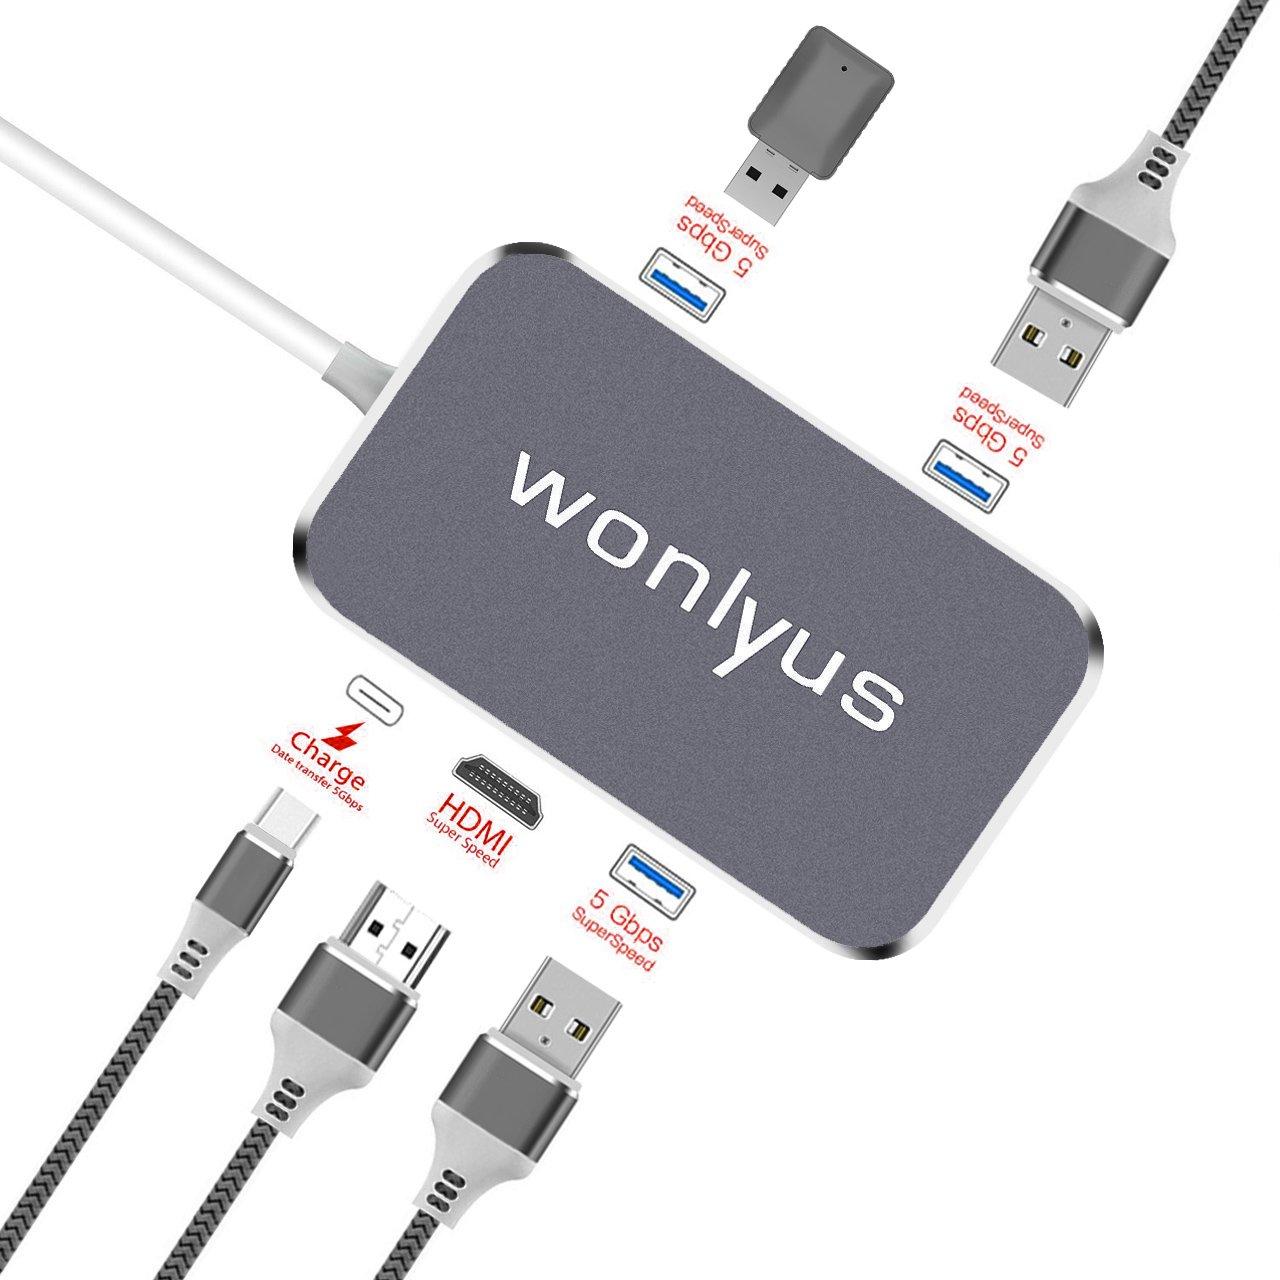 USB C Hub Type-C 3.1 HDMI Thunderbolt Adapter, HDMI 4K 60Hz Thunderbolt 3 USB 3.1 PD Quick Charging Port 100W 3 USB 3.0 Ports for MacBook, Galaxy S8, Galaxy S9 and More